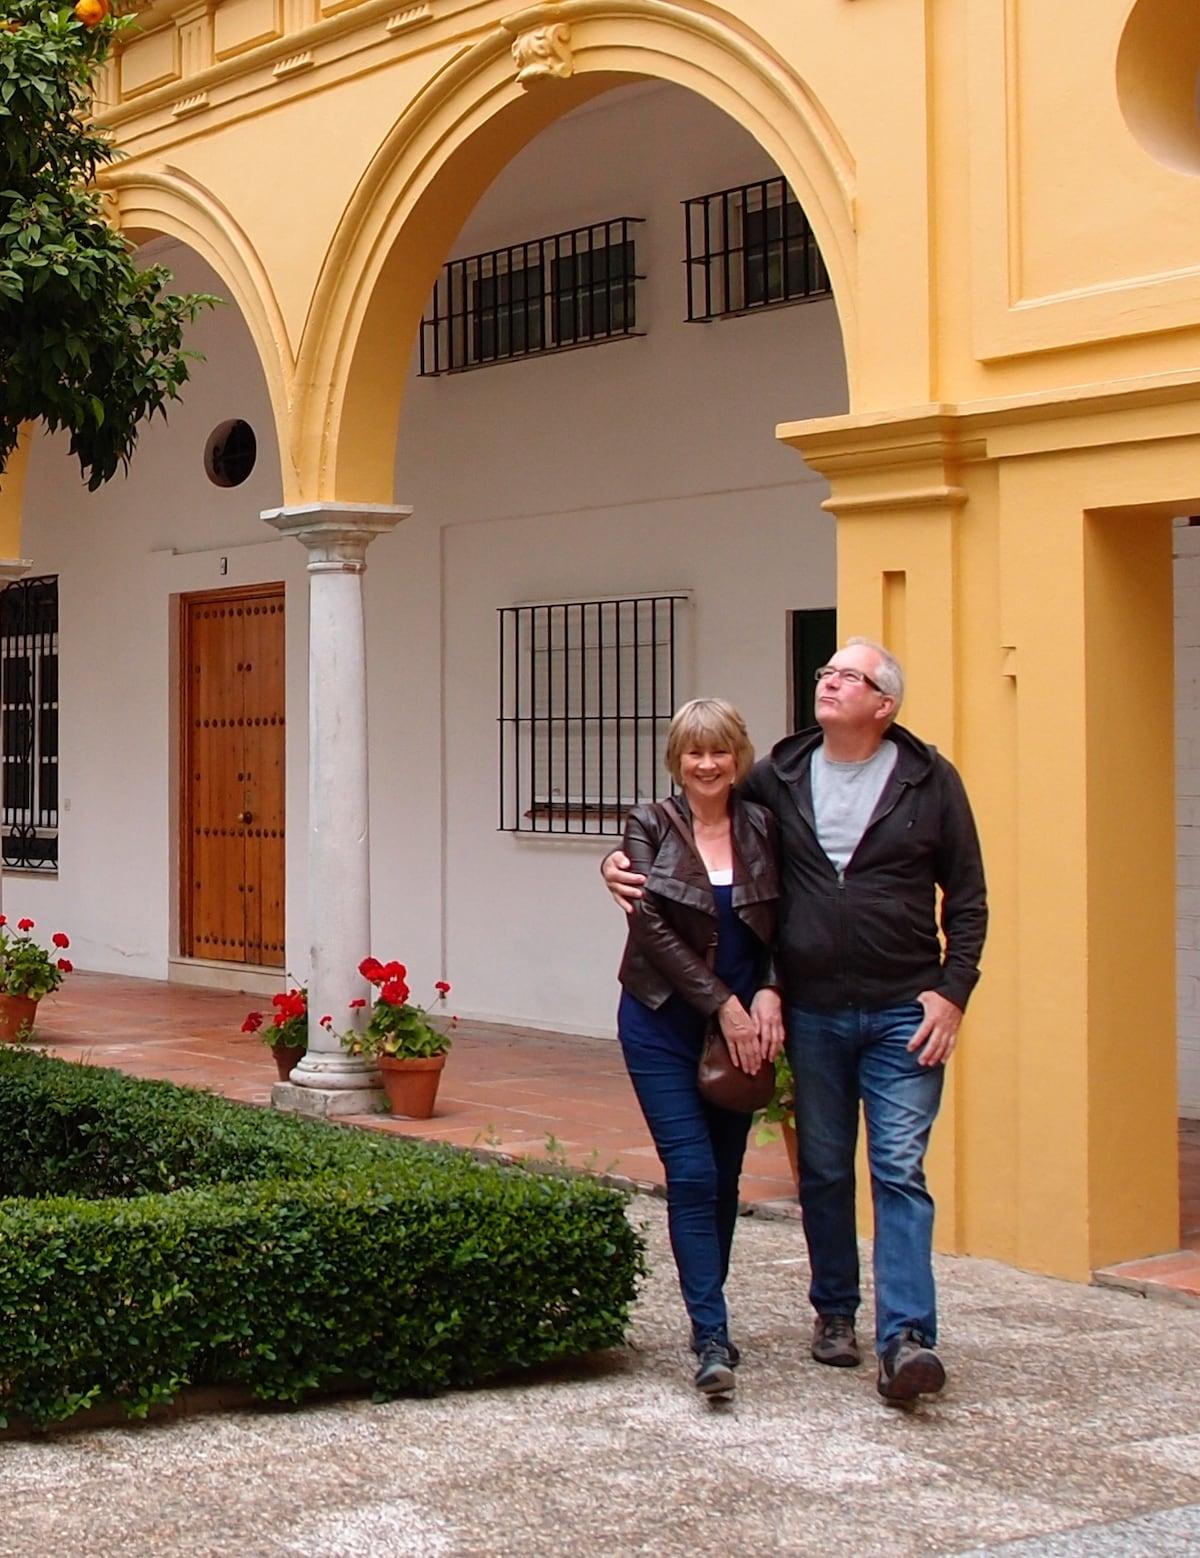 Cheryl & Peter From Donvale, Australia